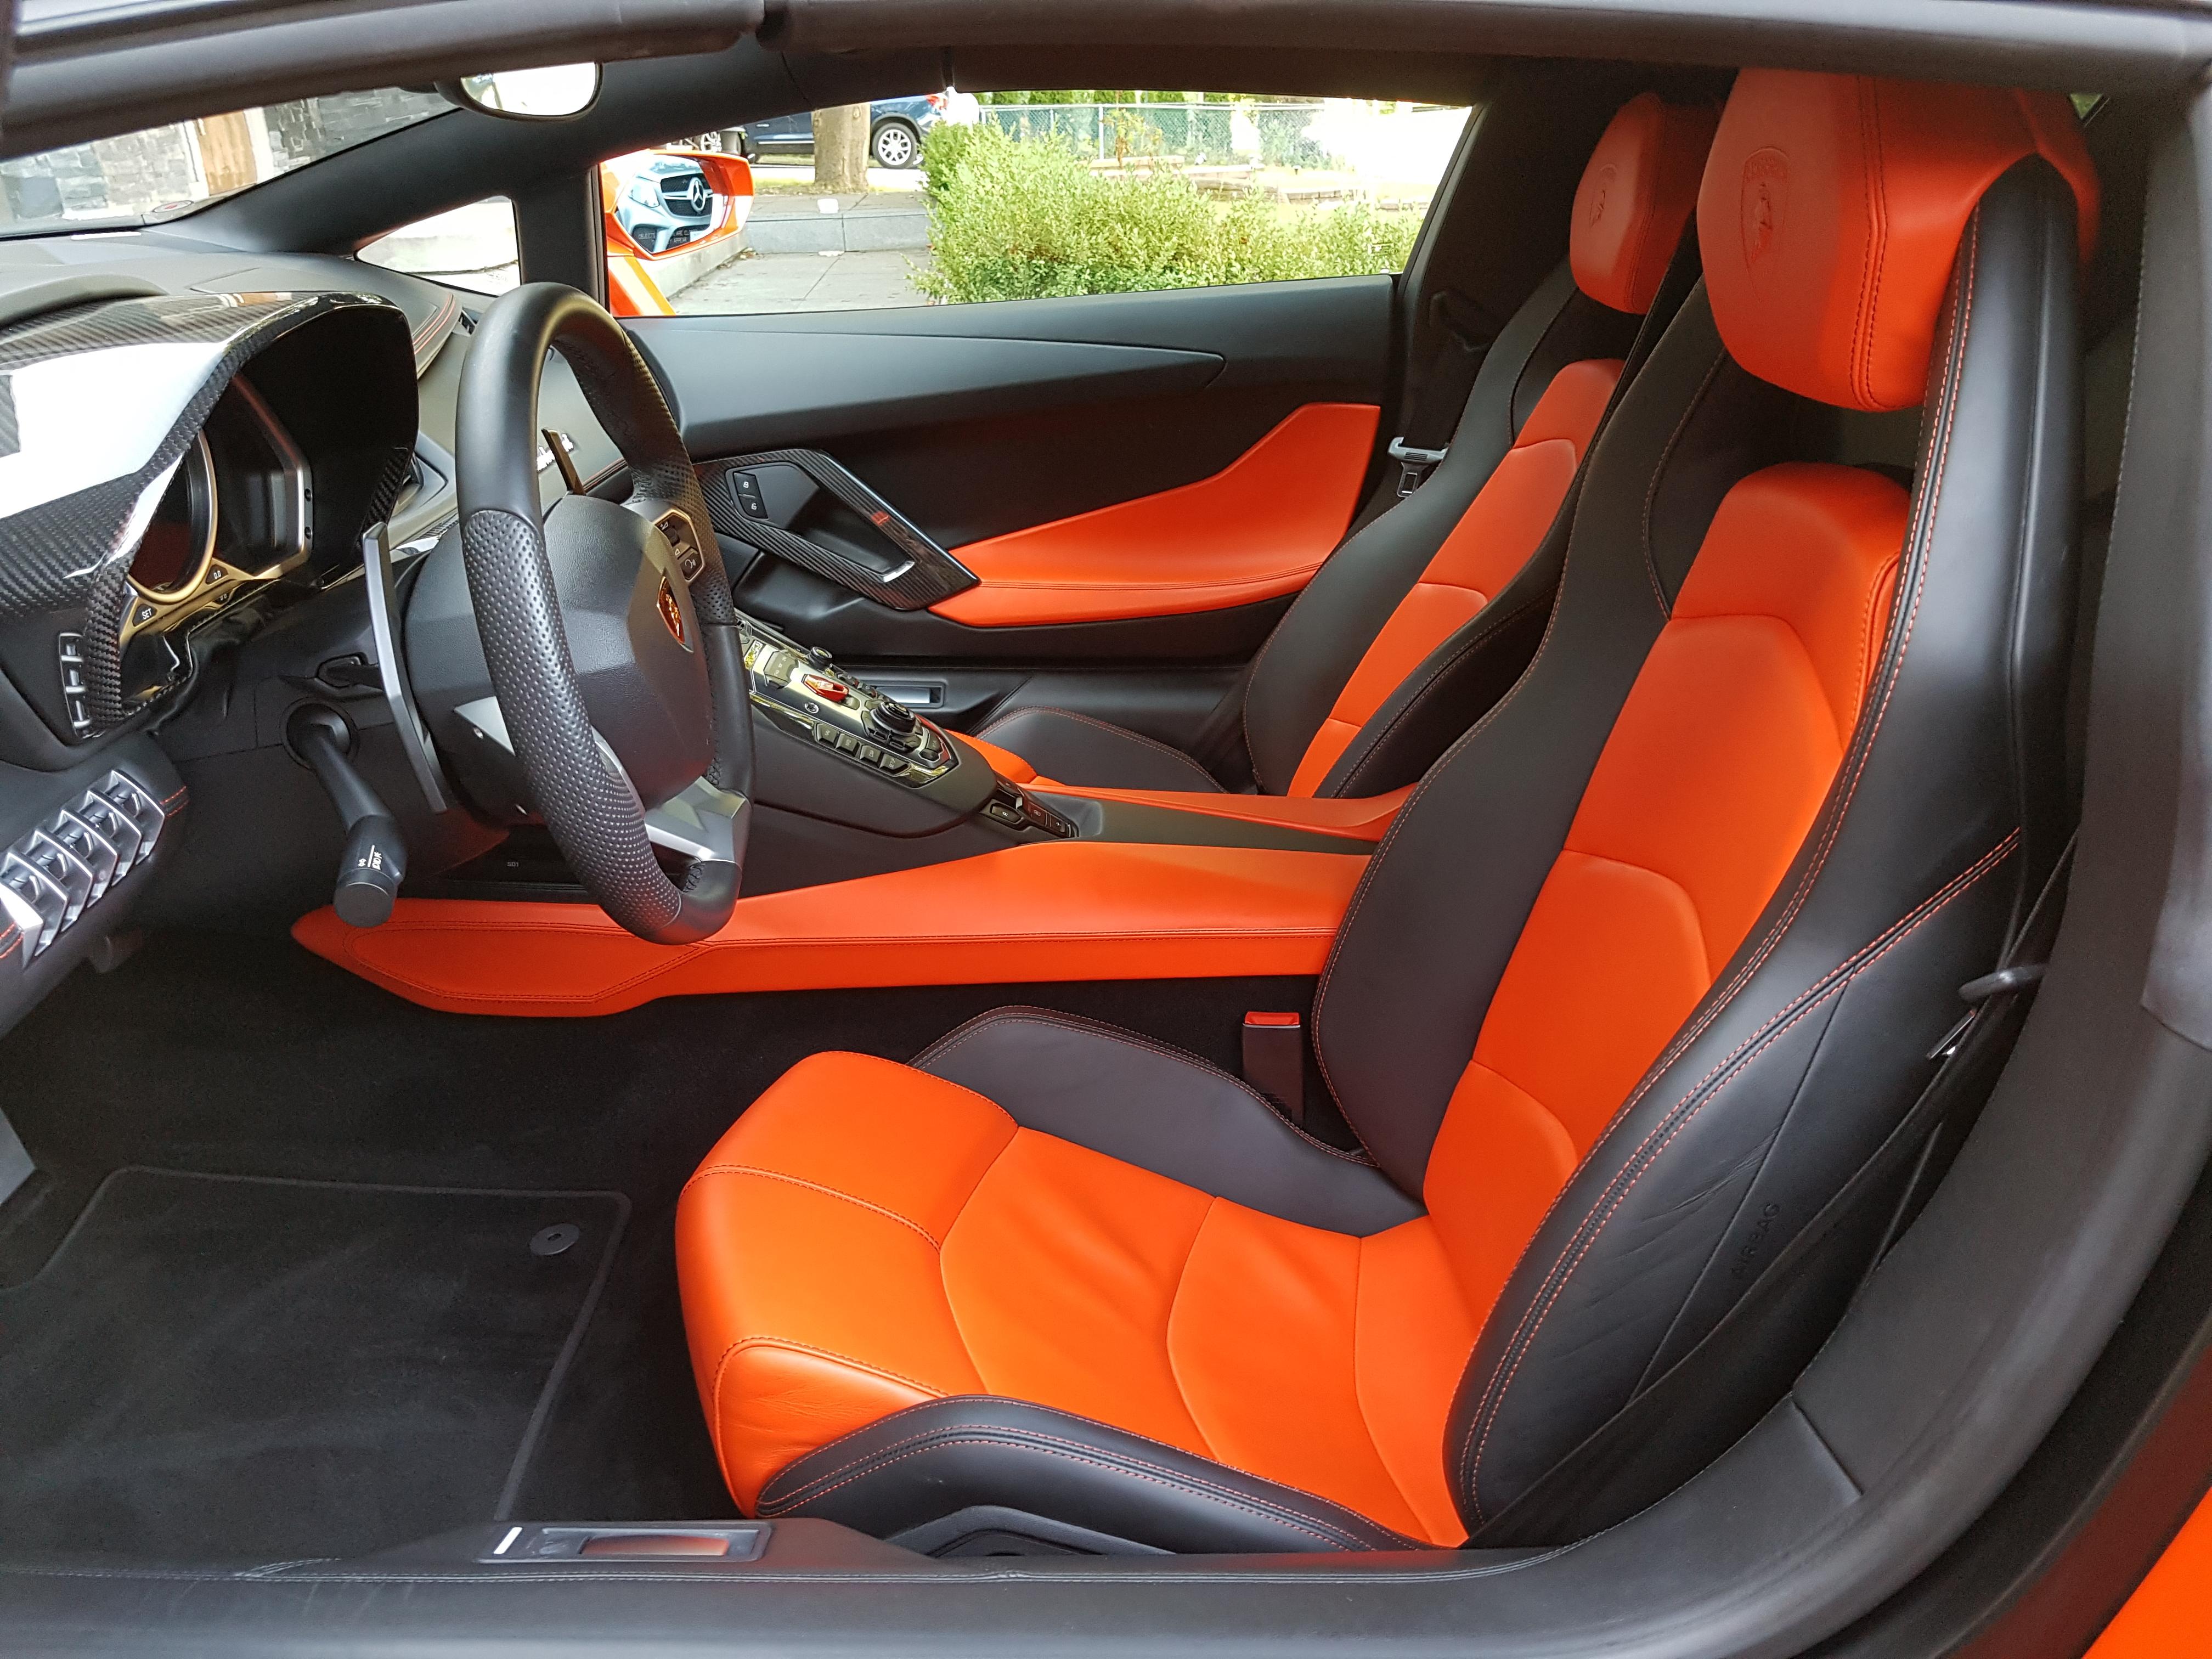 Lamborghini Aventador interior